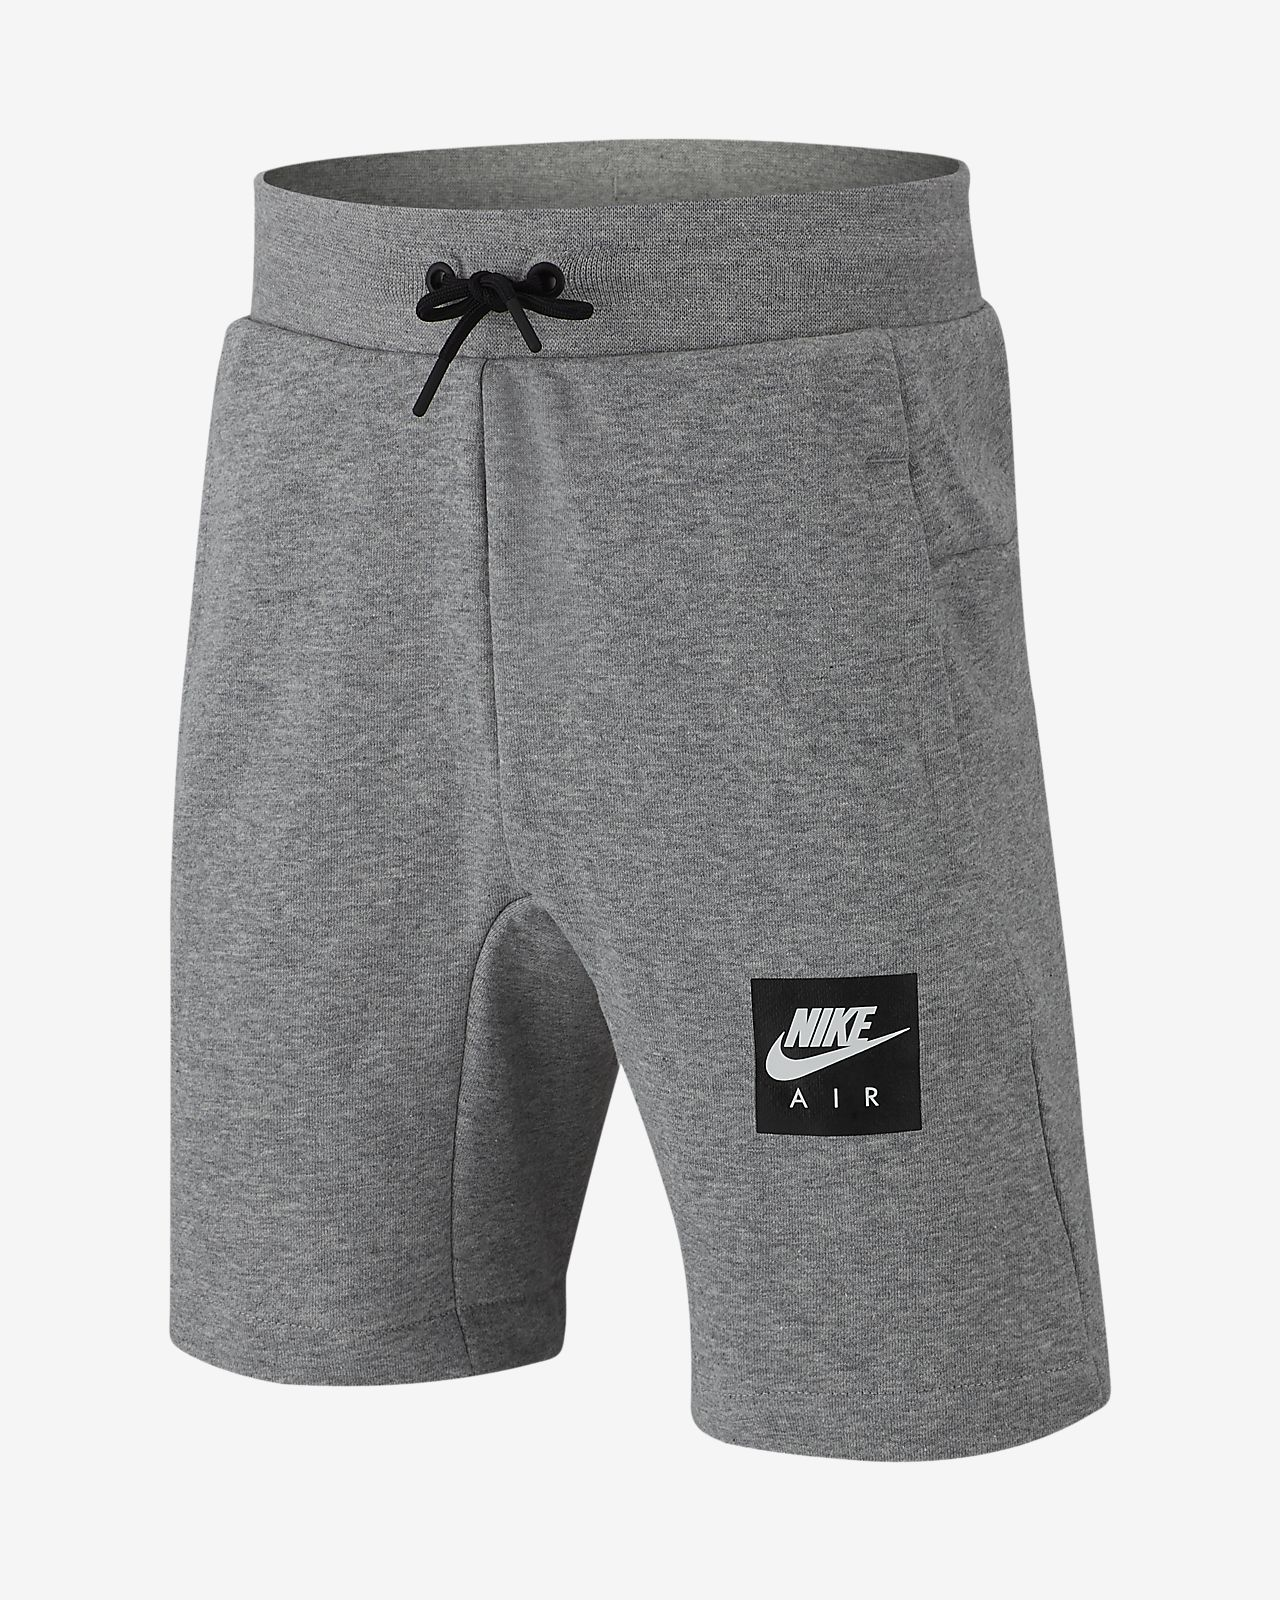 Nen Nike Curts Es Pantalons Air qBWgXw1